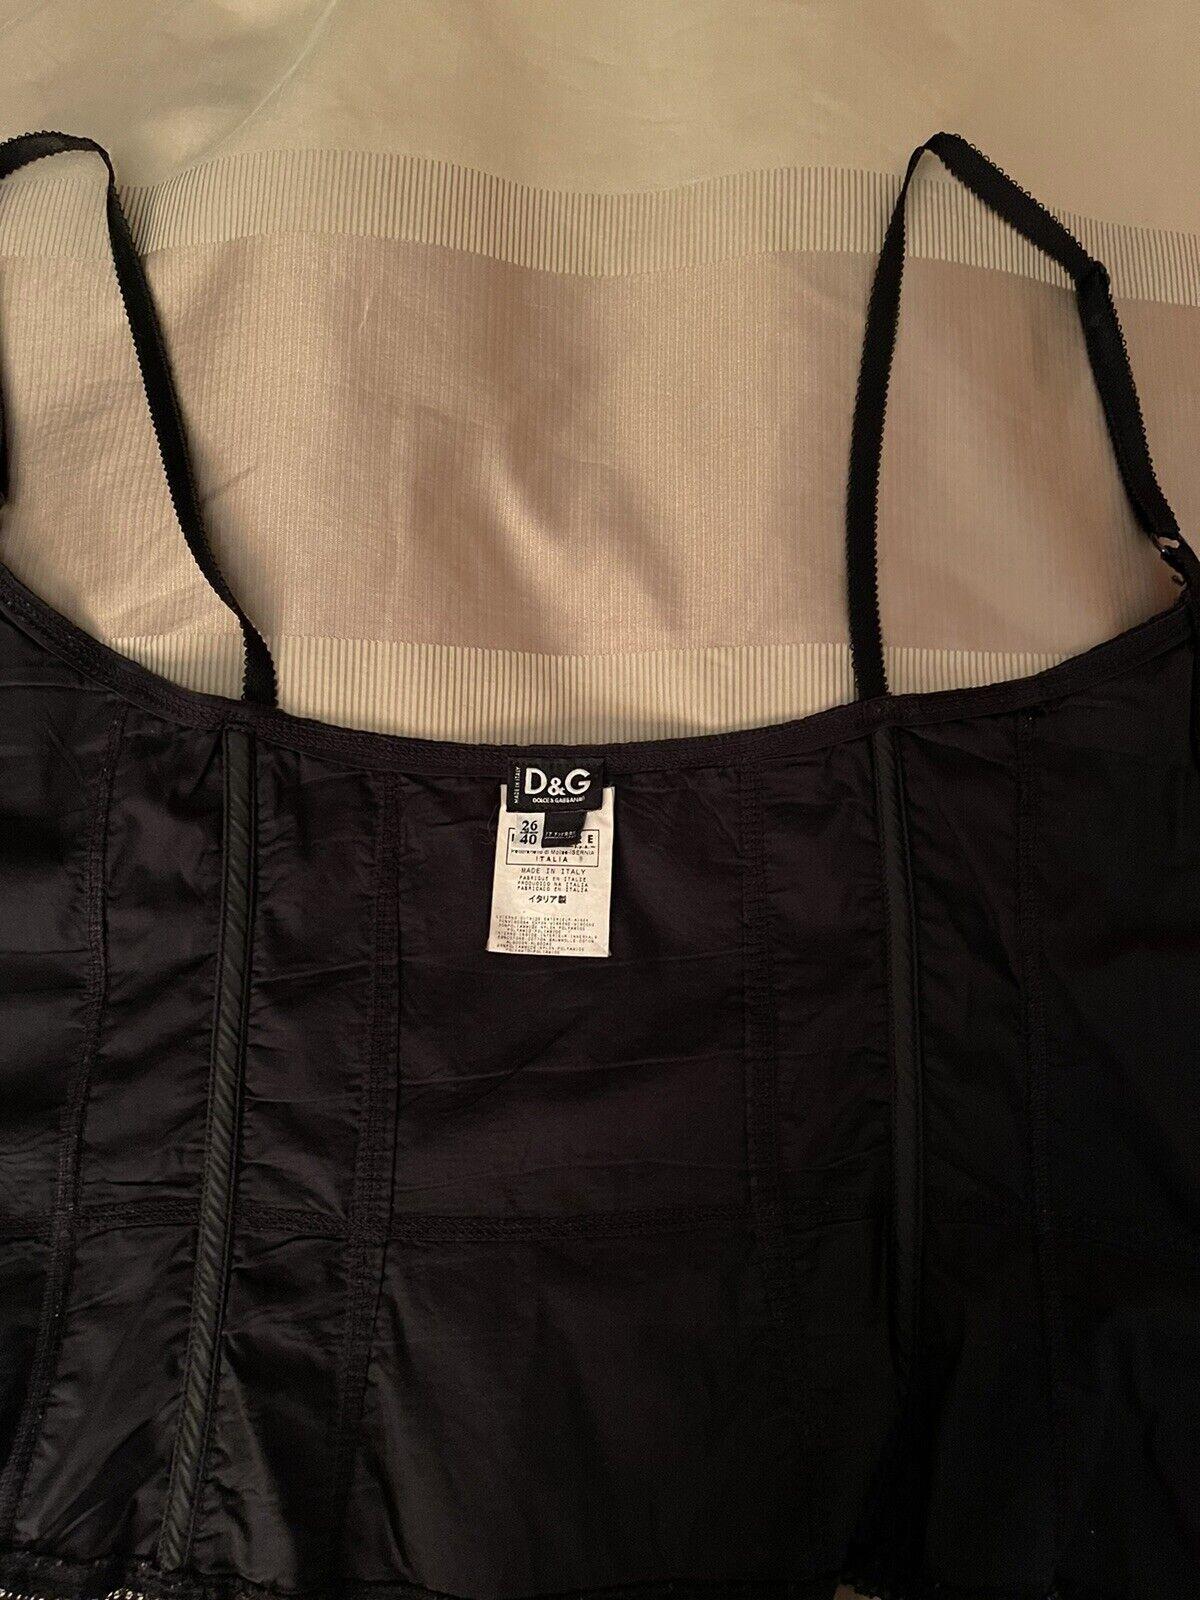 Dolce& Gabbana Black Lace Corset Top Size 26/40 - image 7